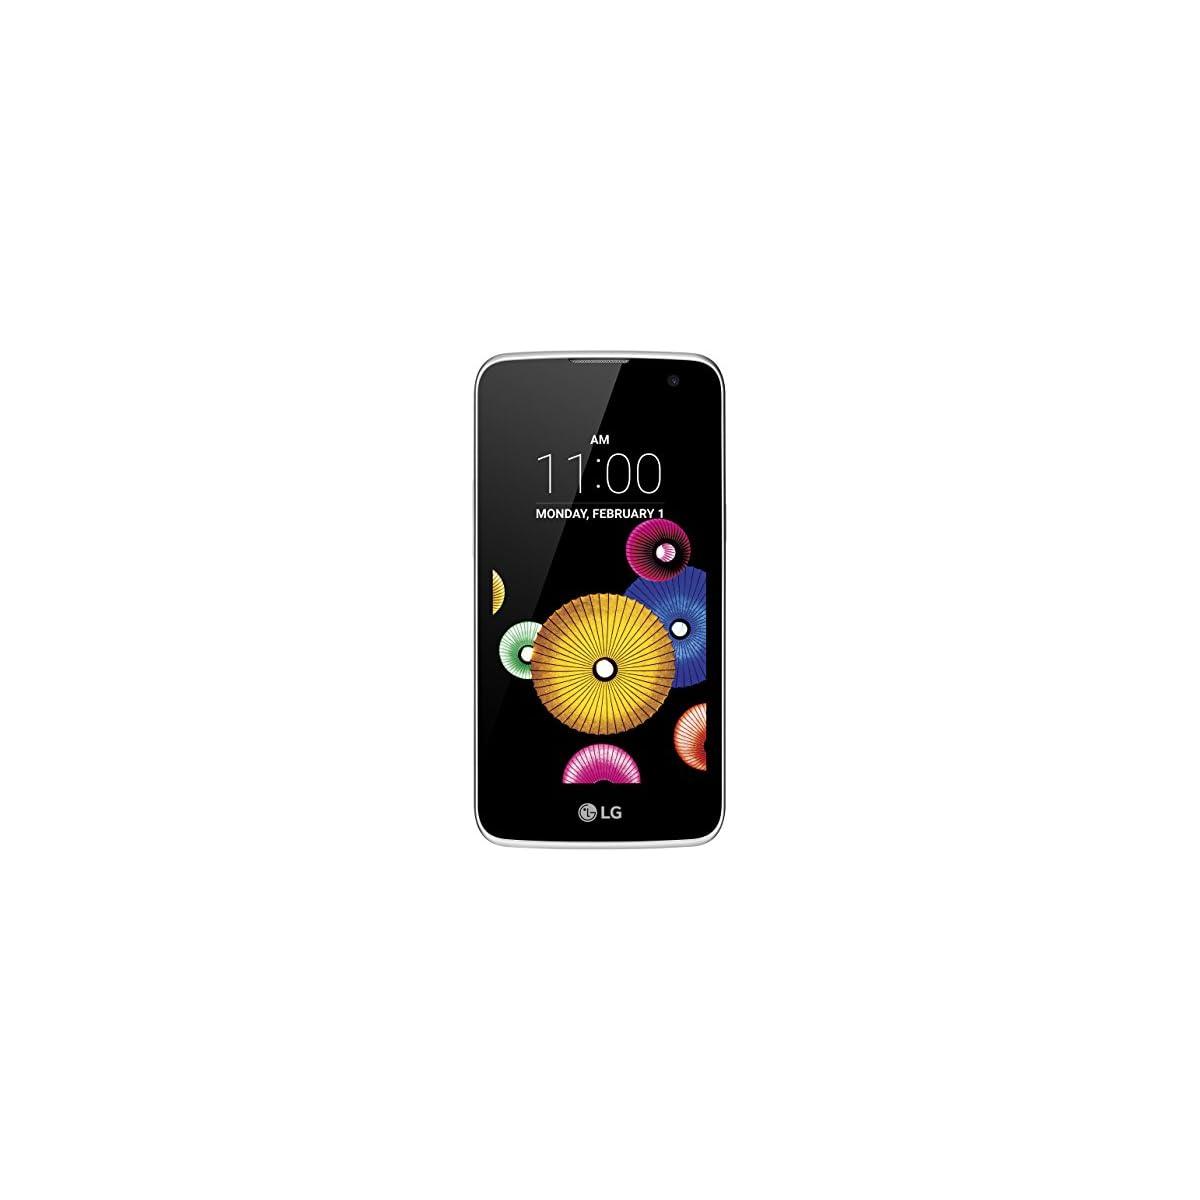 LG Mobile LGK120E.ADEUKU K4 Smartphone (11,4 cm (4,5 Zoll) IPS Display, 5 MP Kamera, LTE, Android 5.1, Wechselakku, MicroSD Slot)